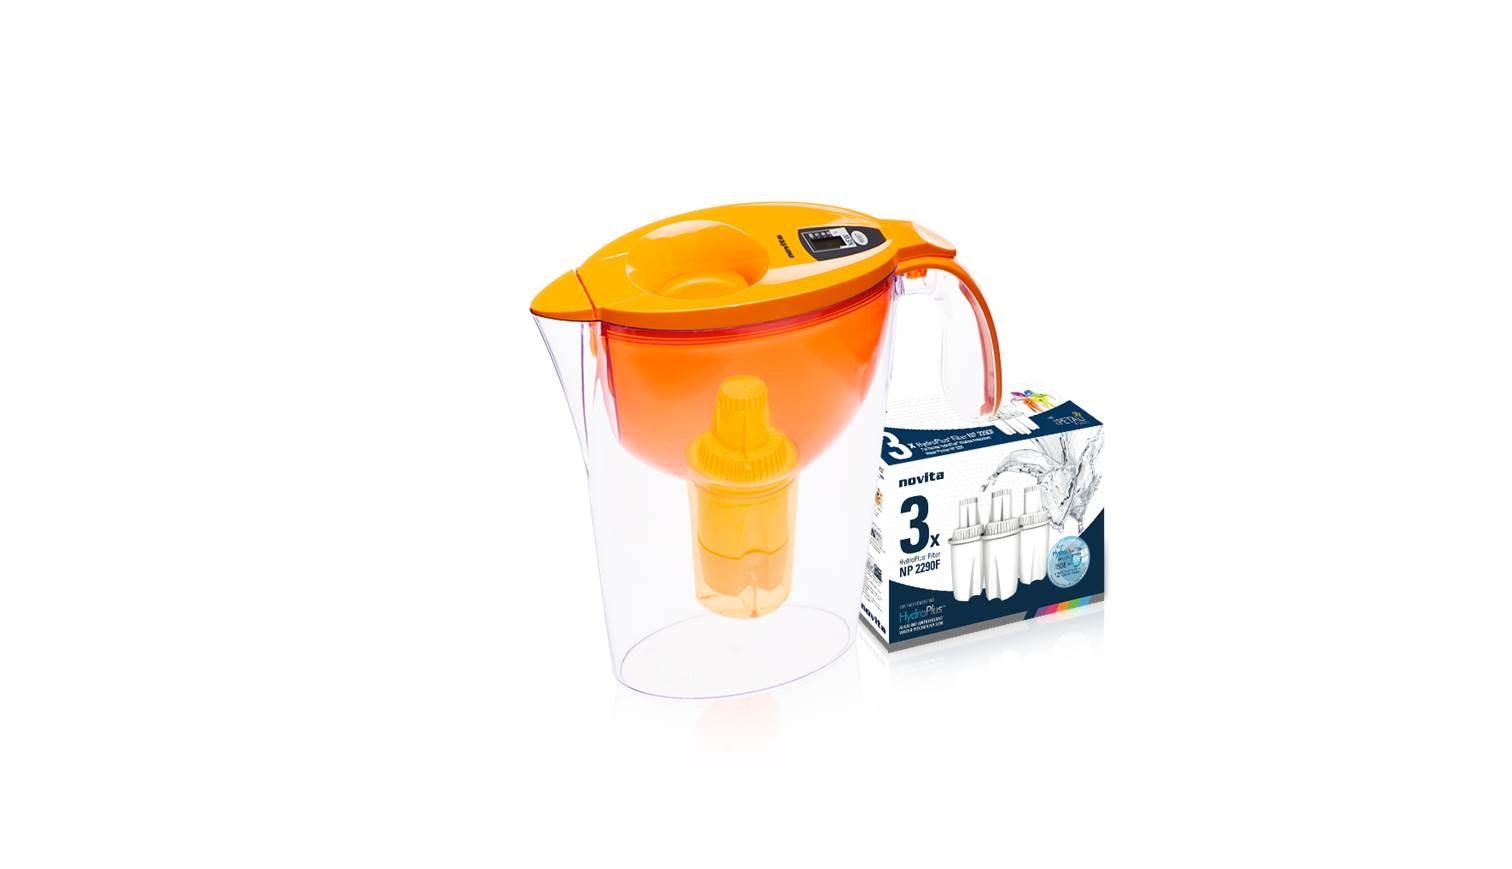 Novita Np 2290 Water Pitcher Bundle Orange Harvey